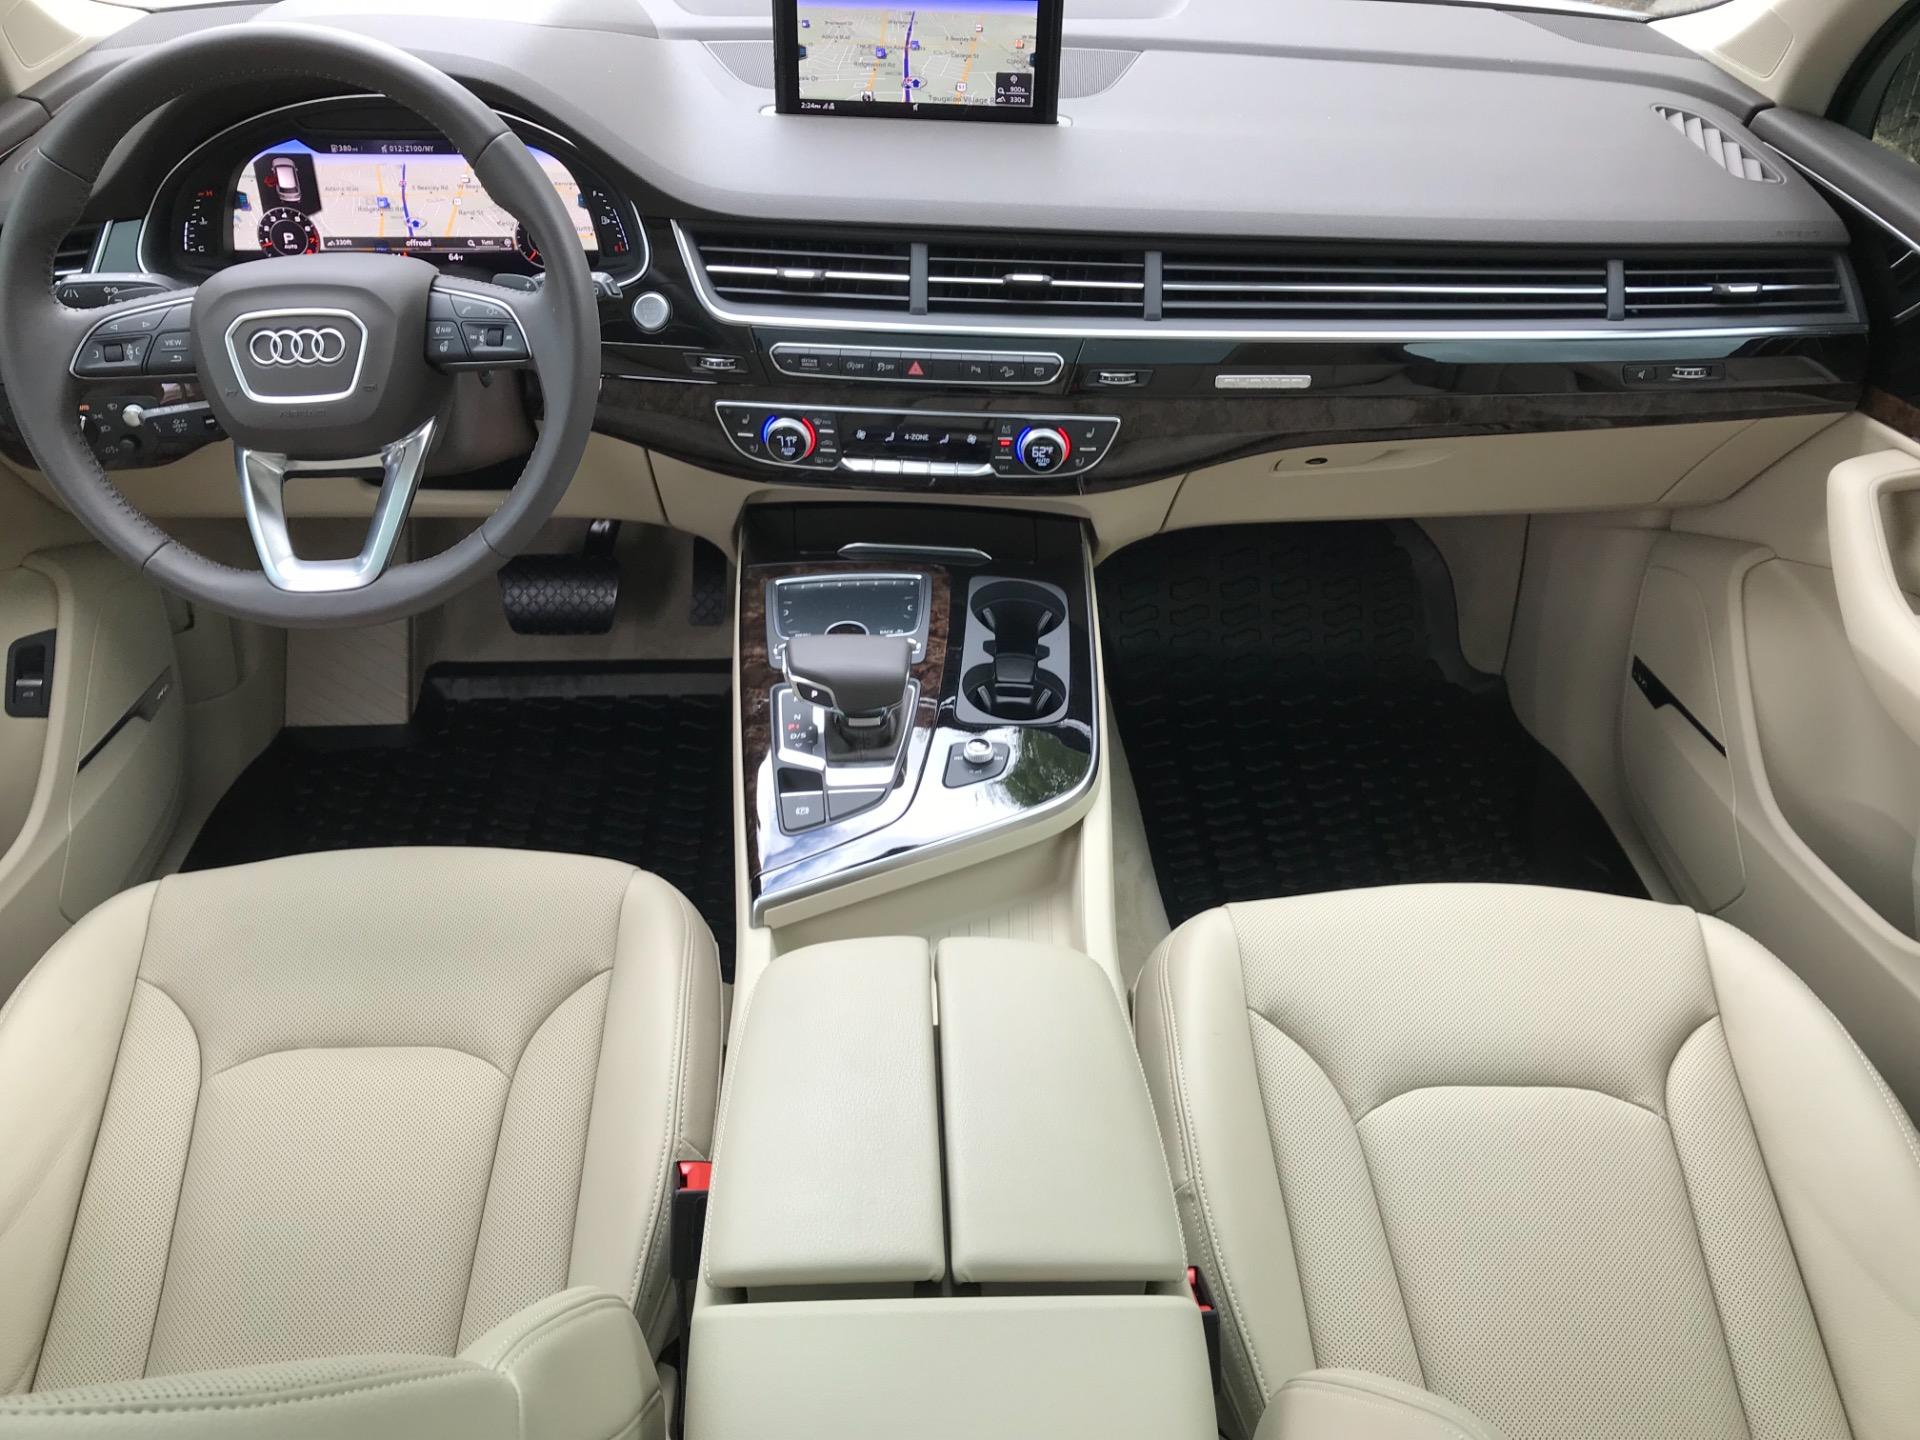 2018 Audi Q7 Prestige Stock Cjd018786 For Sale Near Jackson Ms Ms Audi Dealer